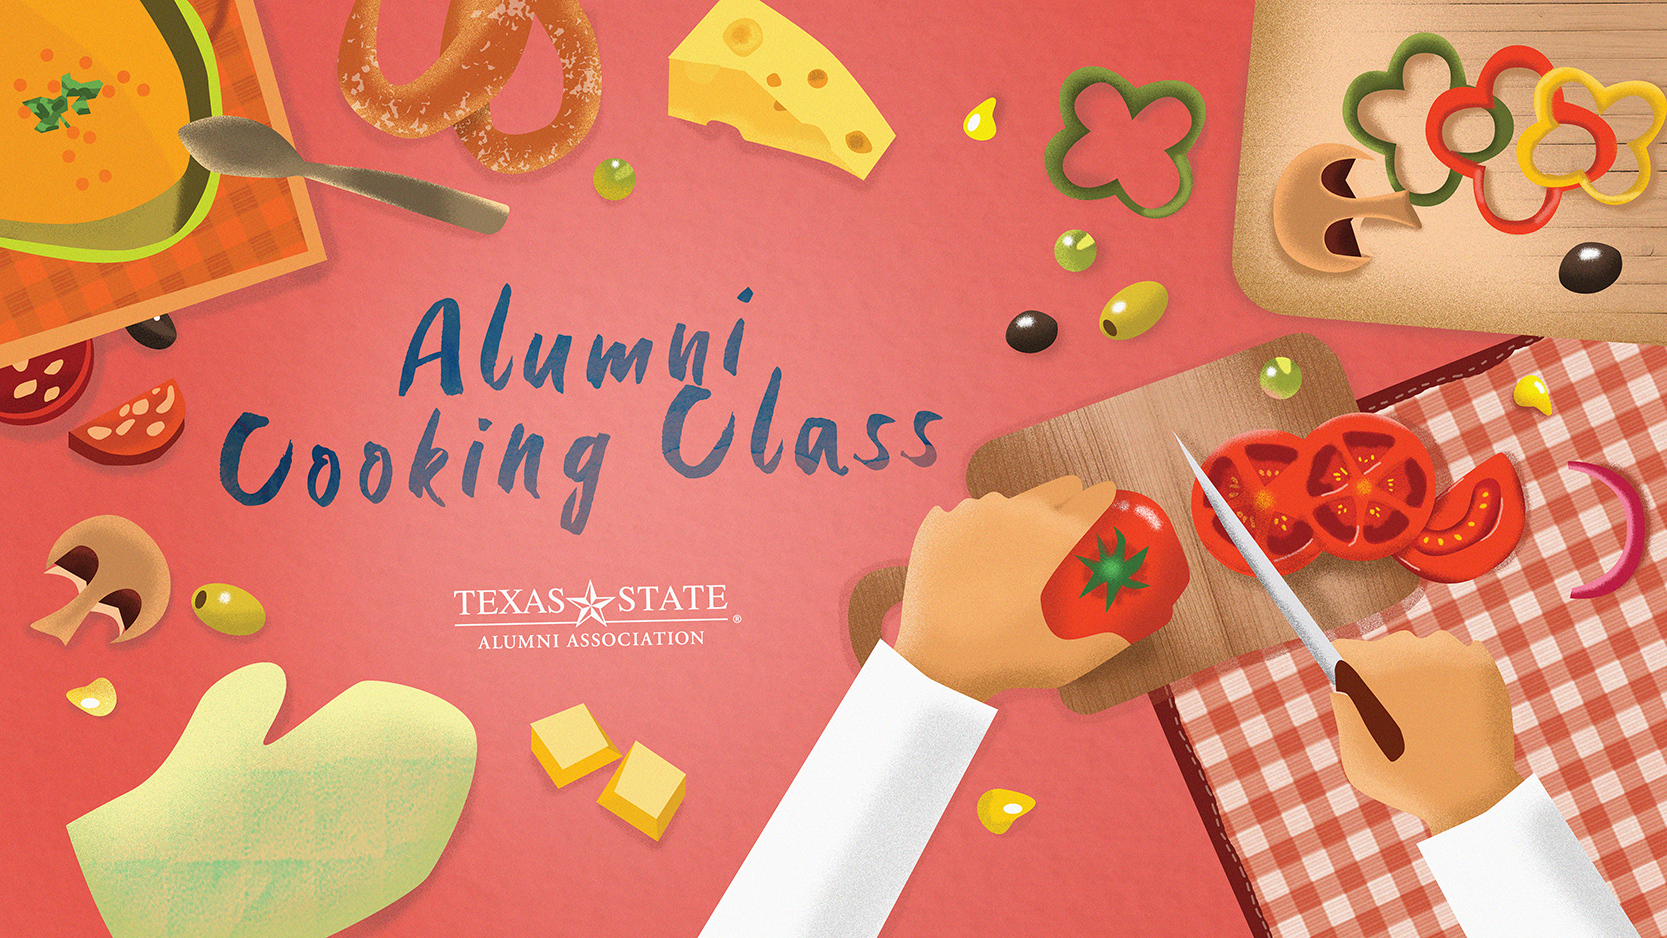 Alumni Cooking Class